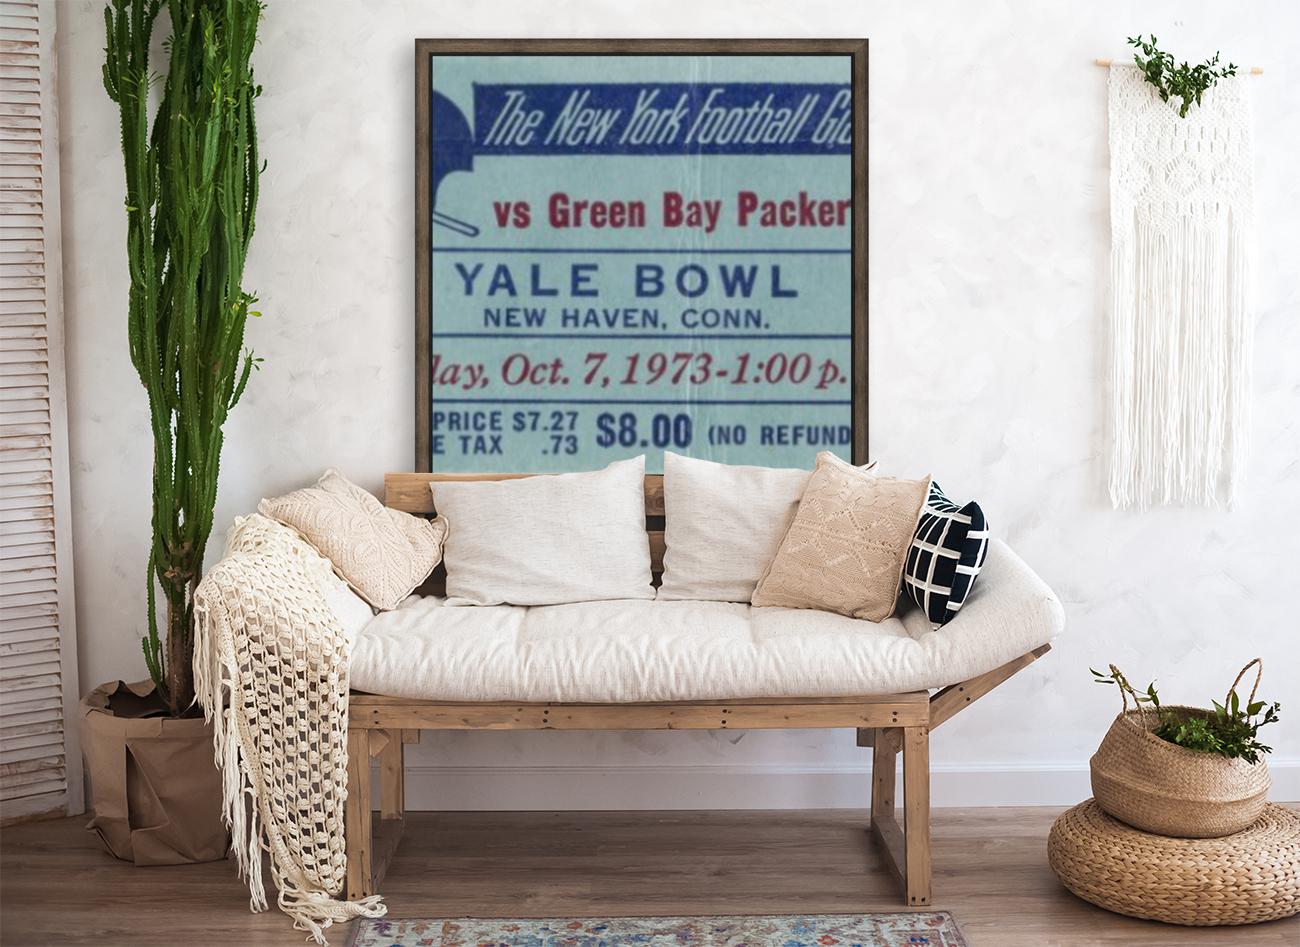 1973_National Football League_New York Giants vs. Green Bay Packers_Yale Bowl_Row One  Art